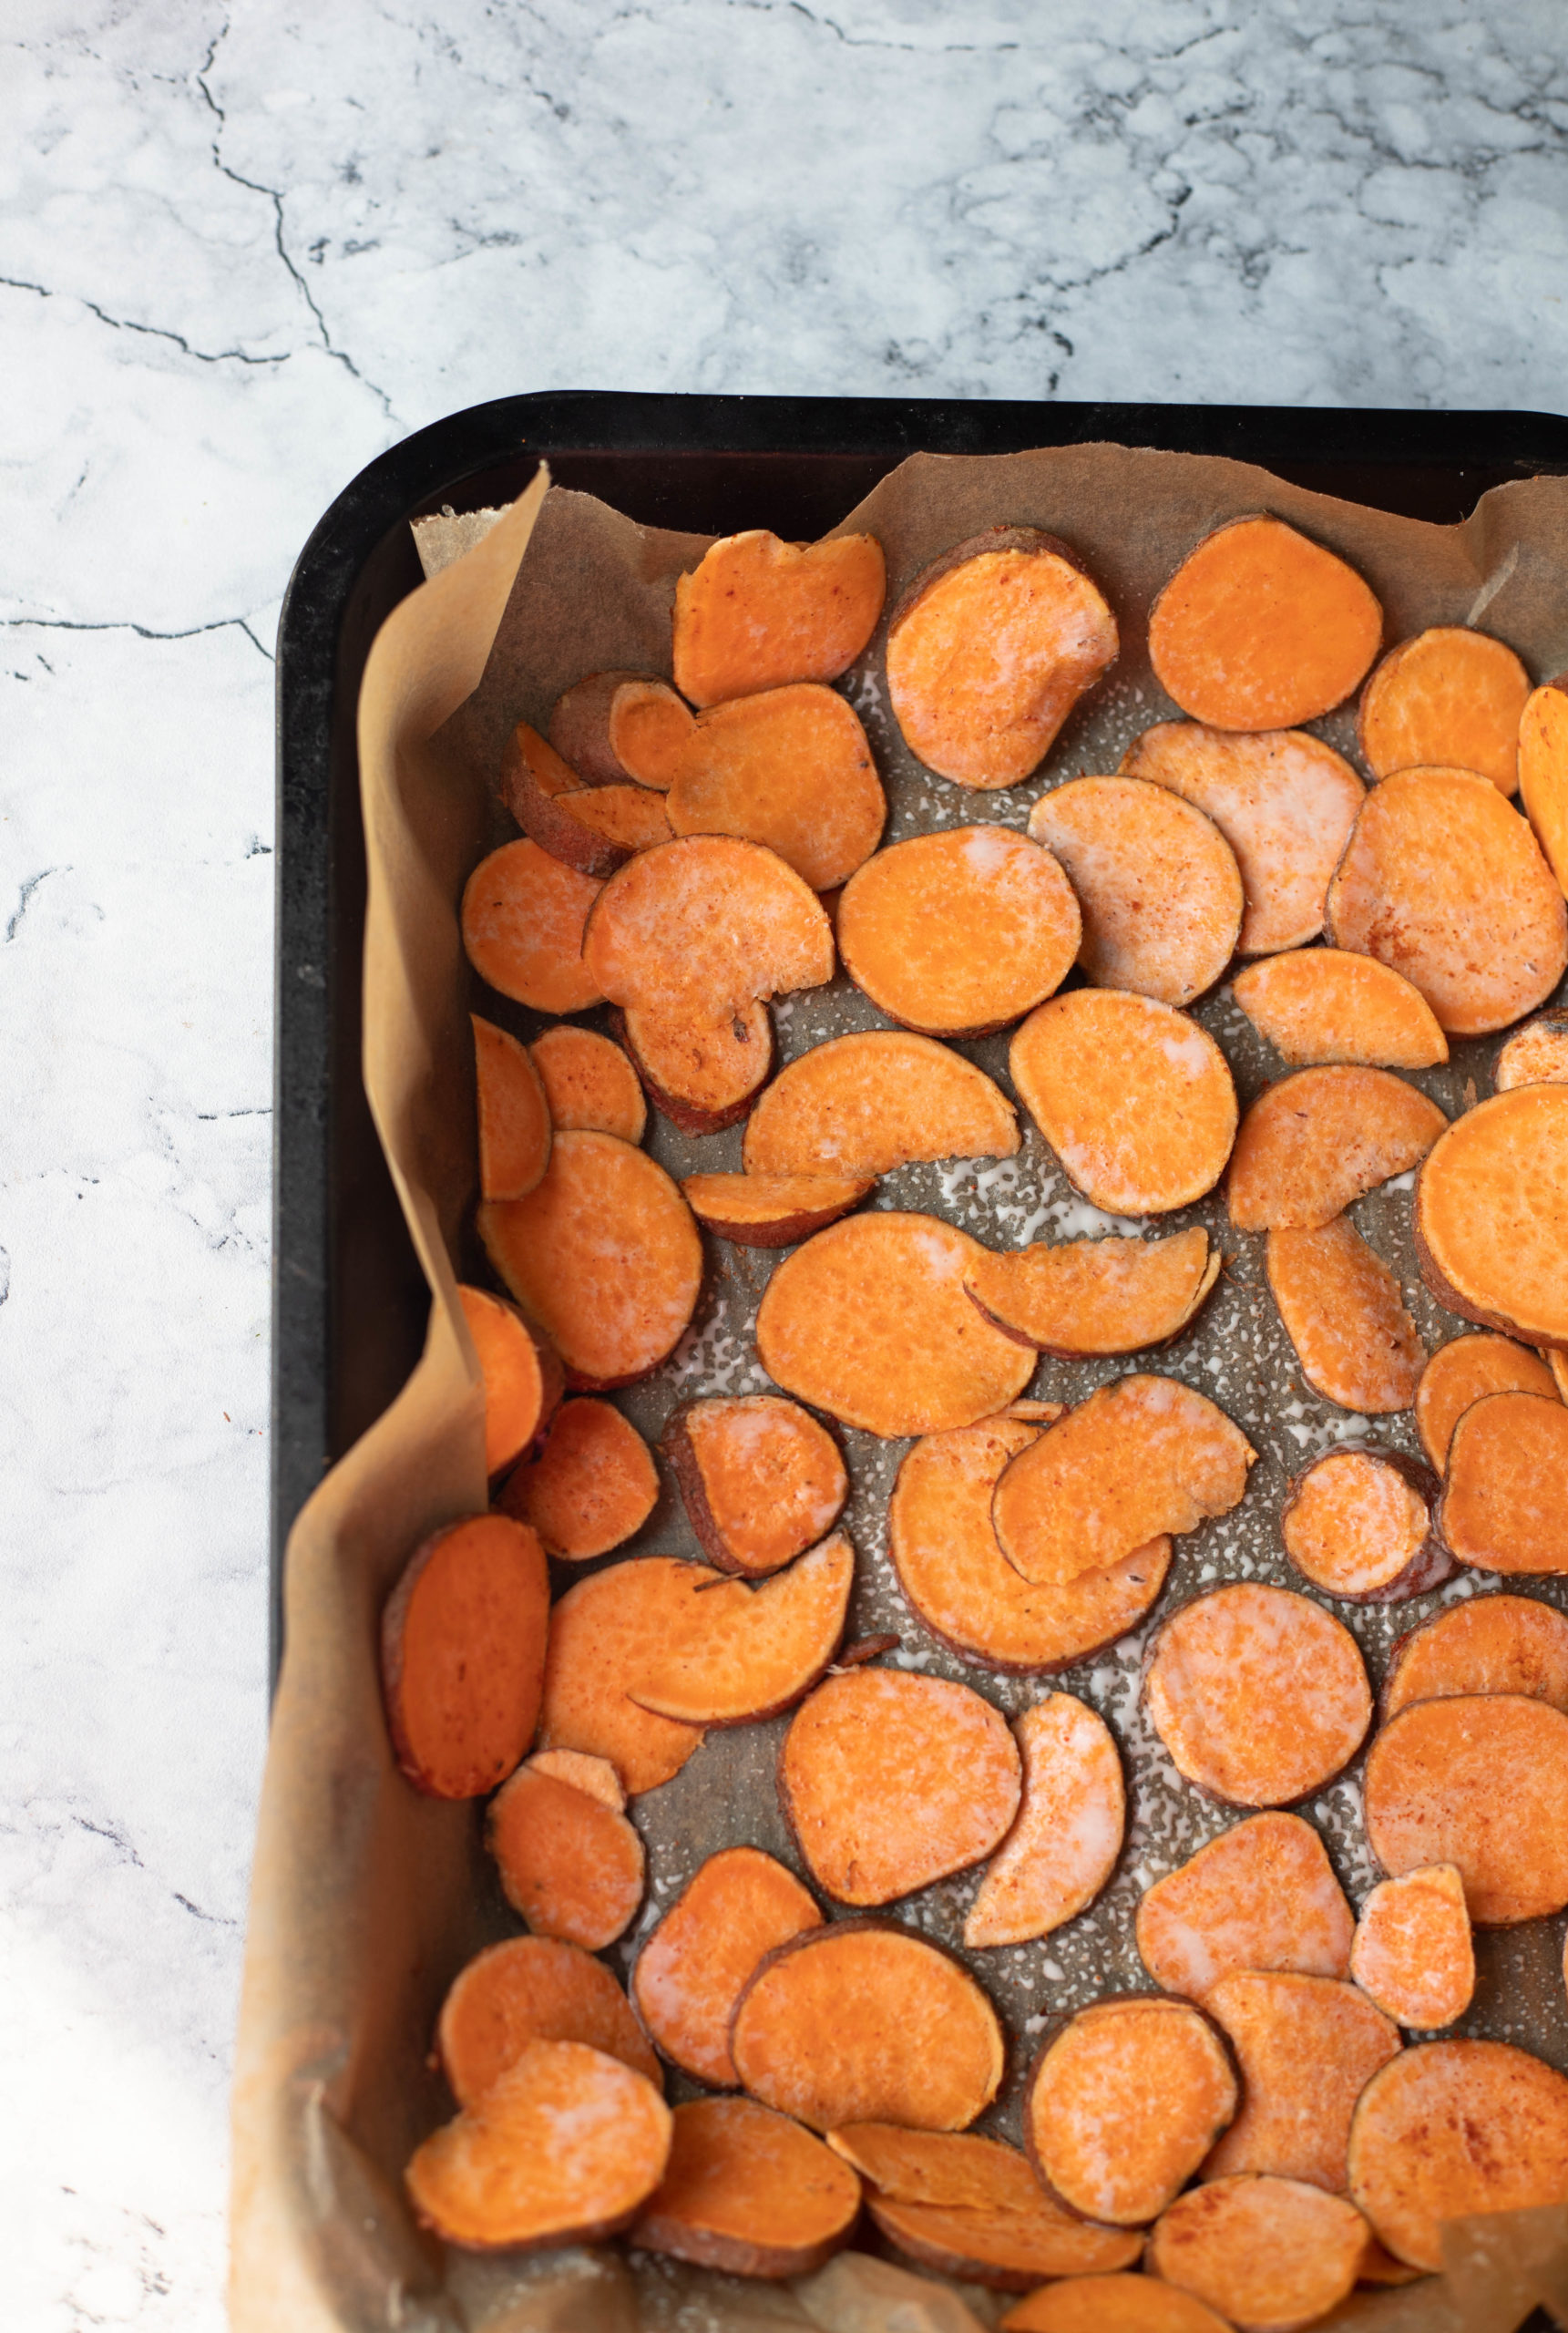 ready to bake sweet potato chips